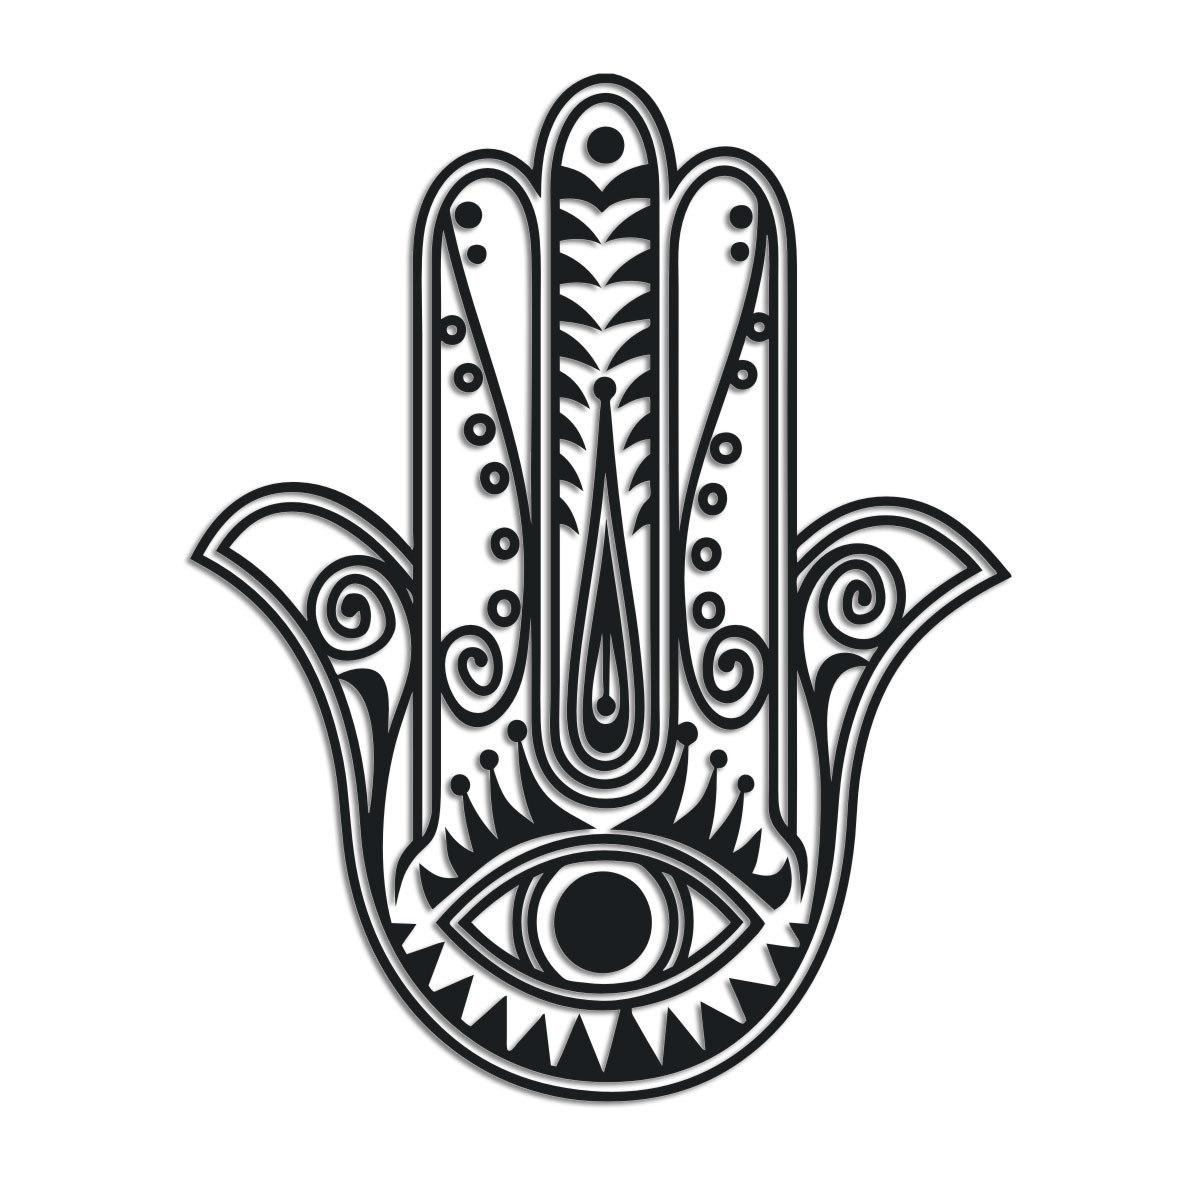 7 Spiritual Symbols to Deepen Your Yoga & Meditation ...